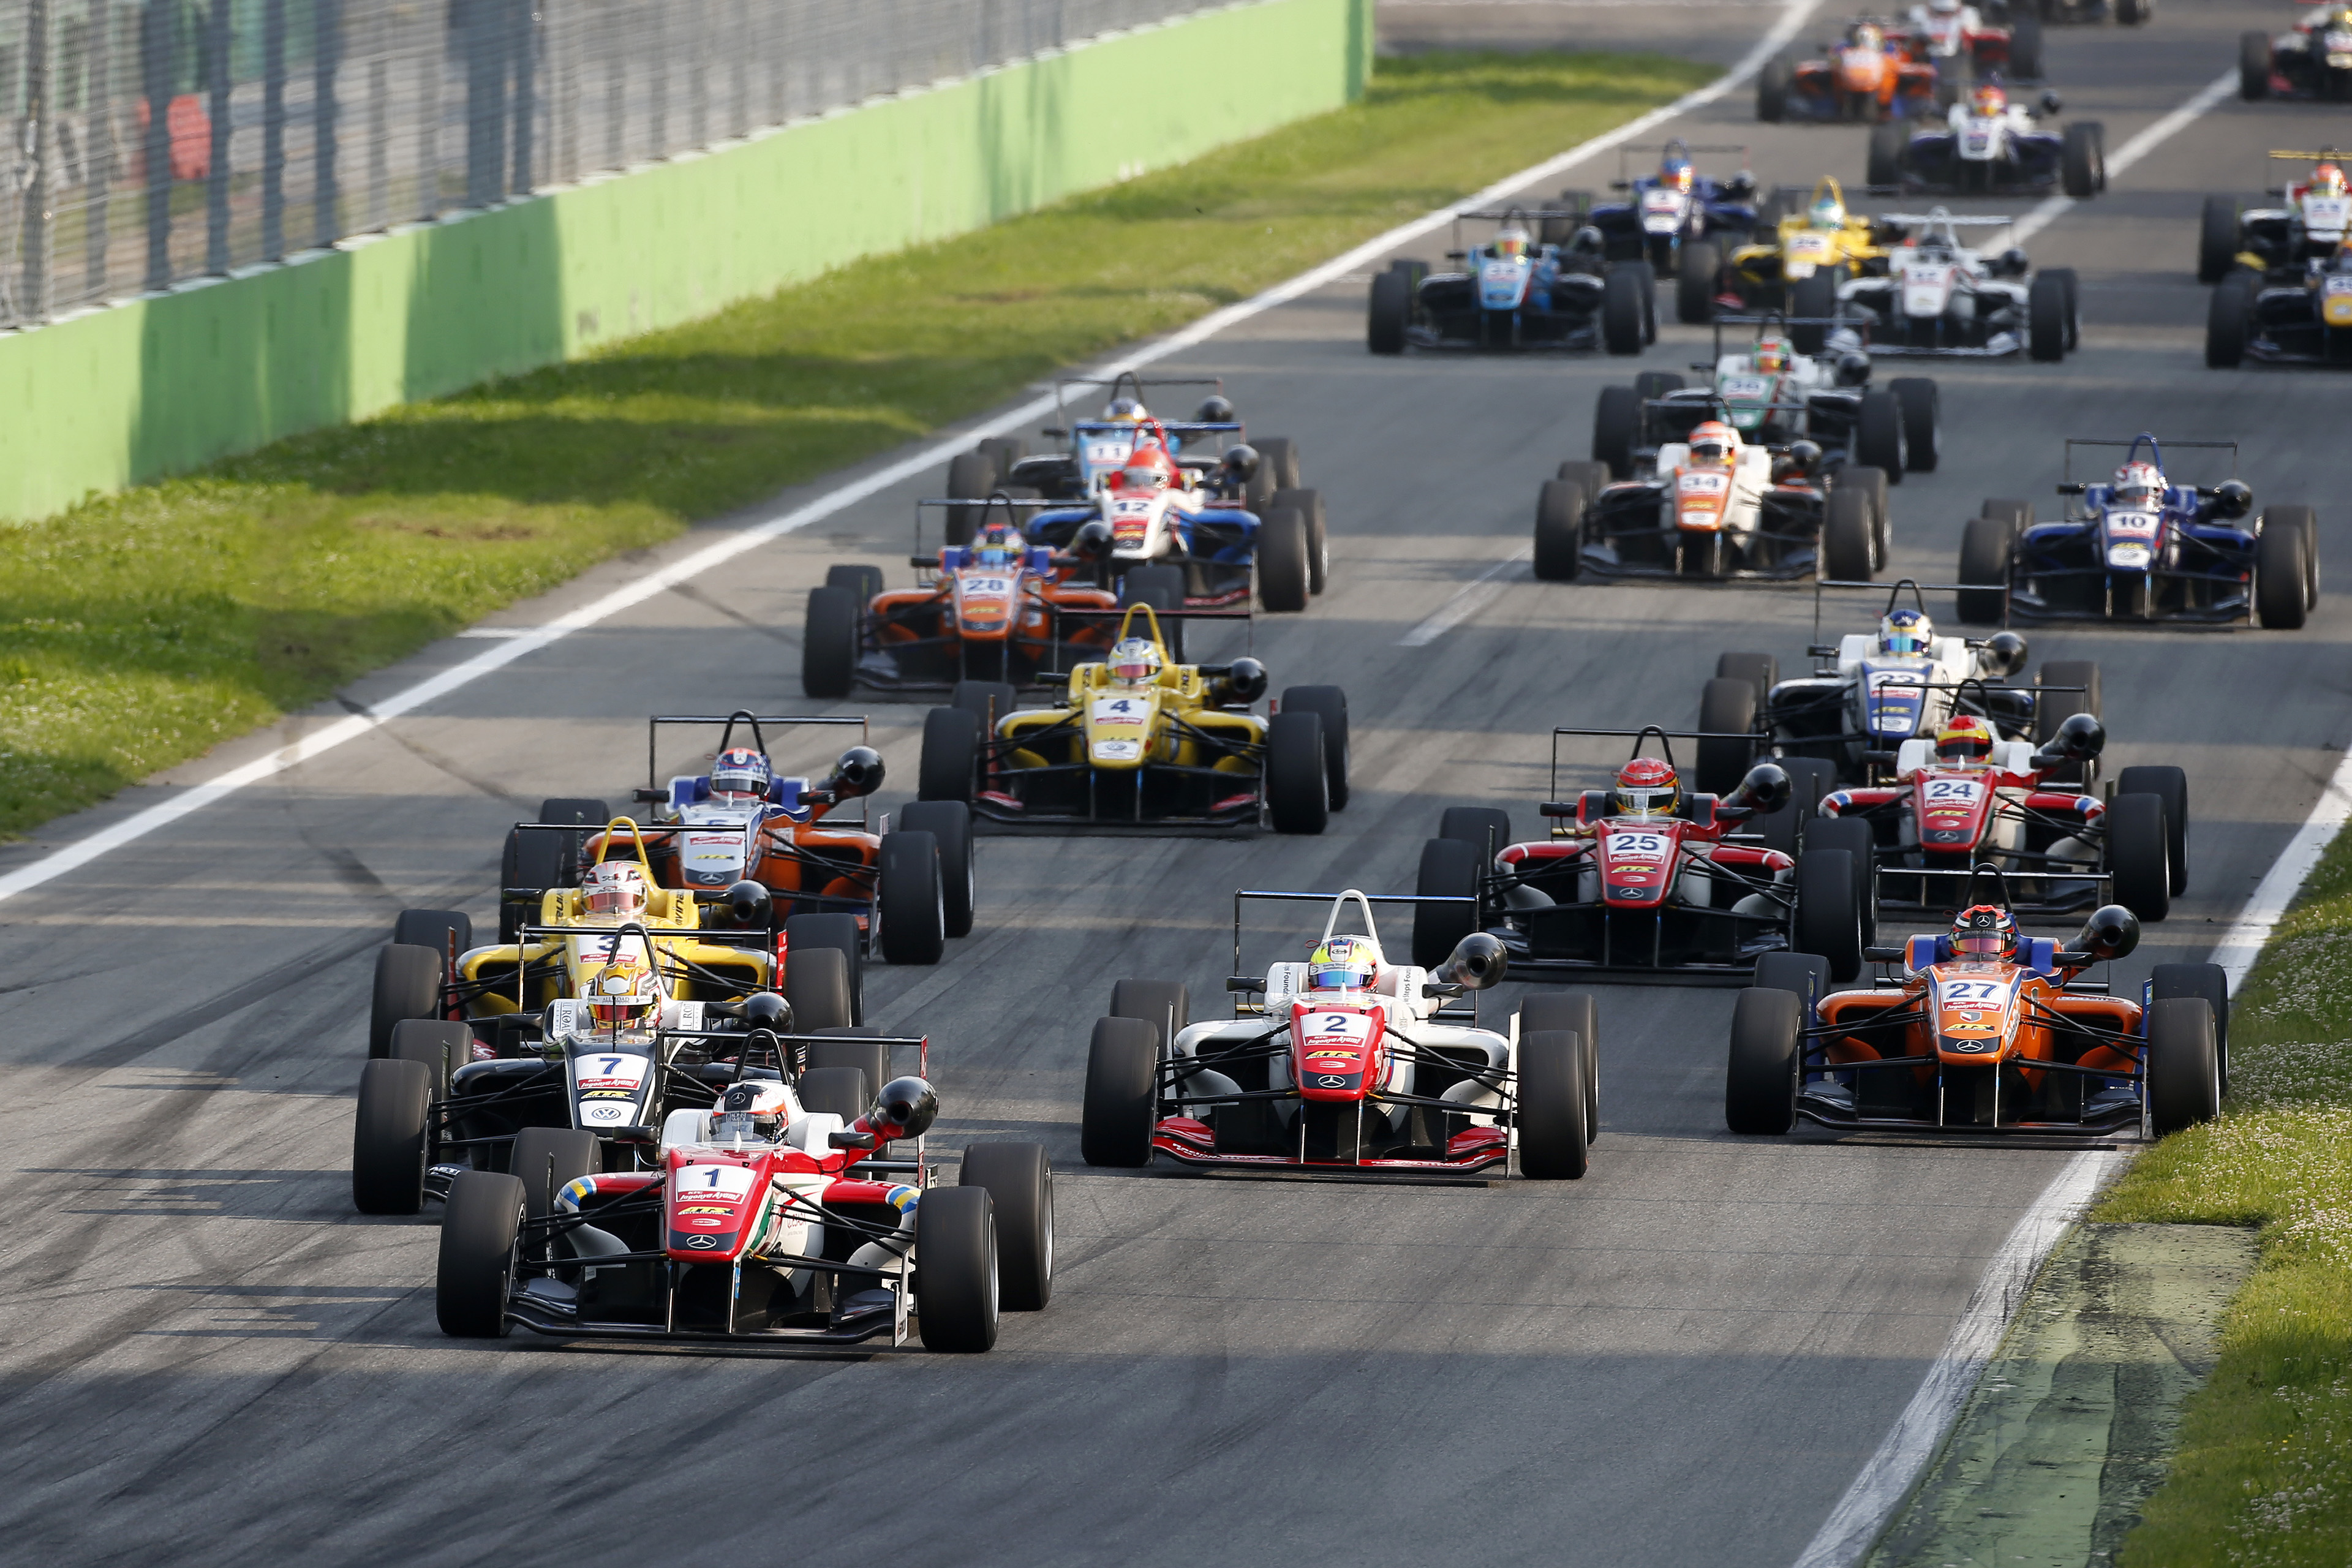 FIA Formula 3 European Championship, round 4, race 2, Monza (ITA)